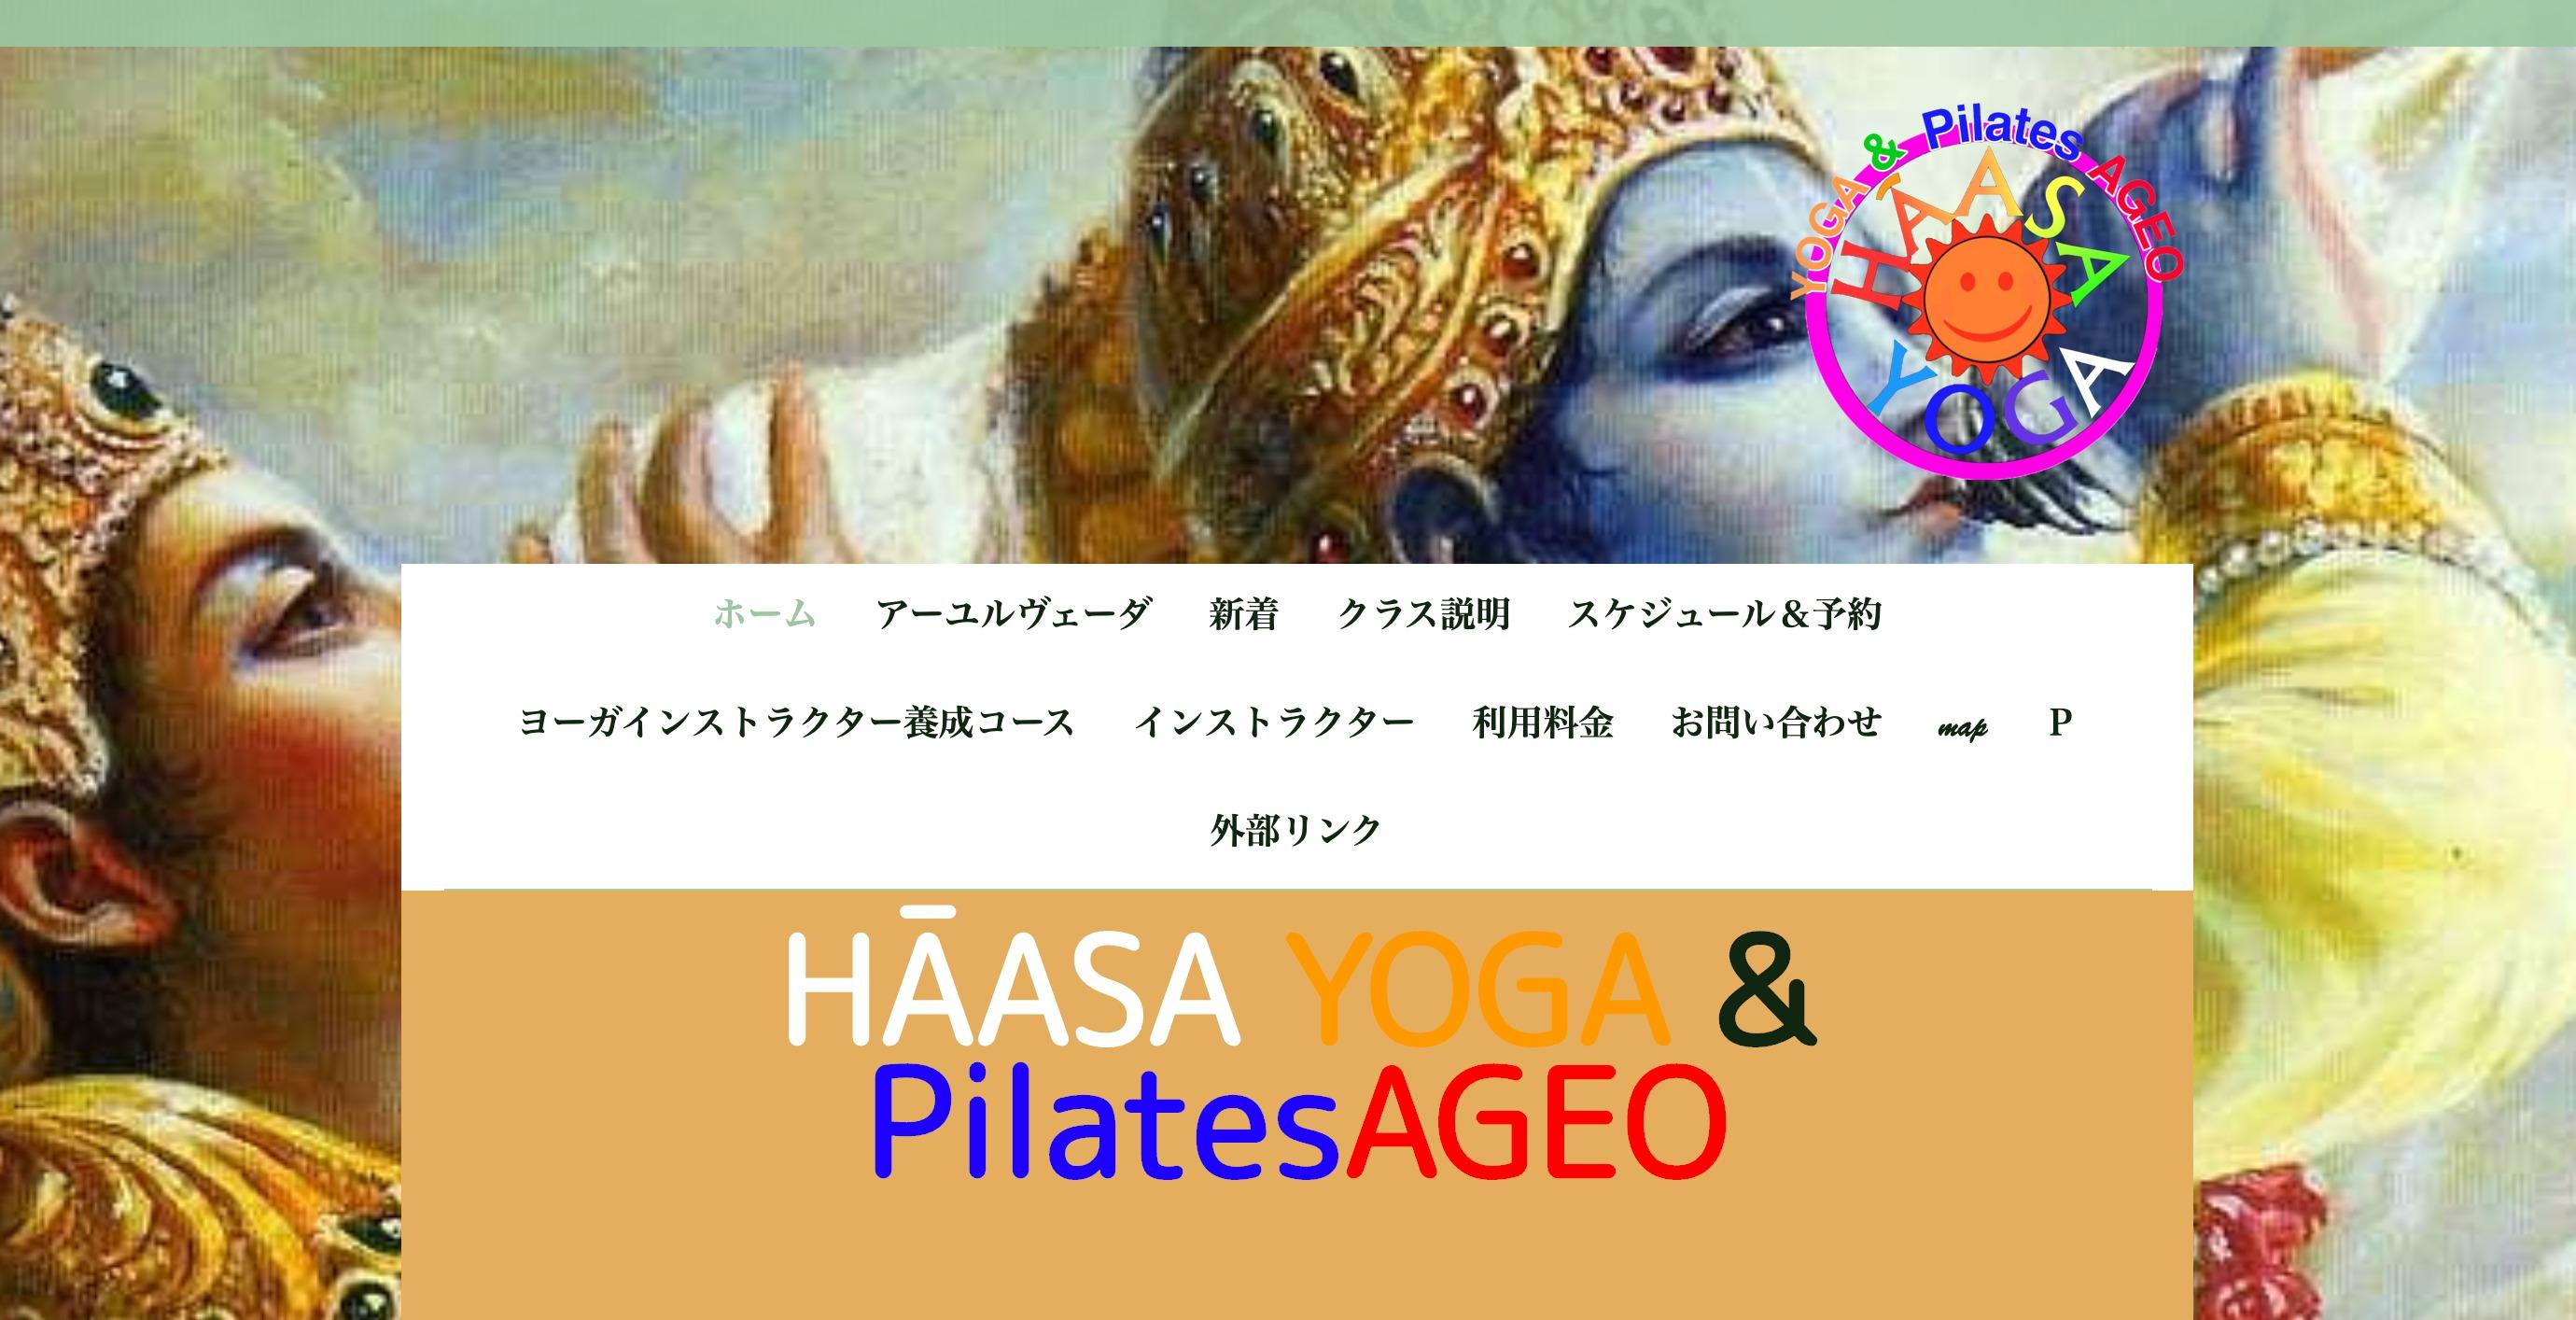 HAASA YOGA & Pilates AGEOの画像